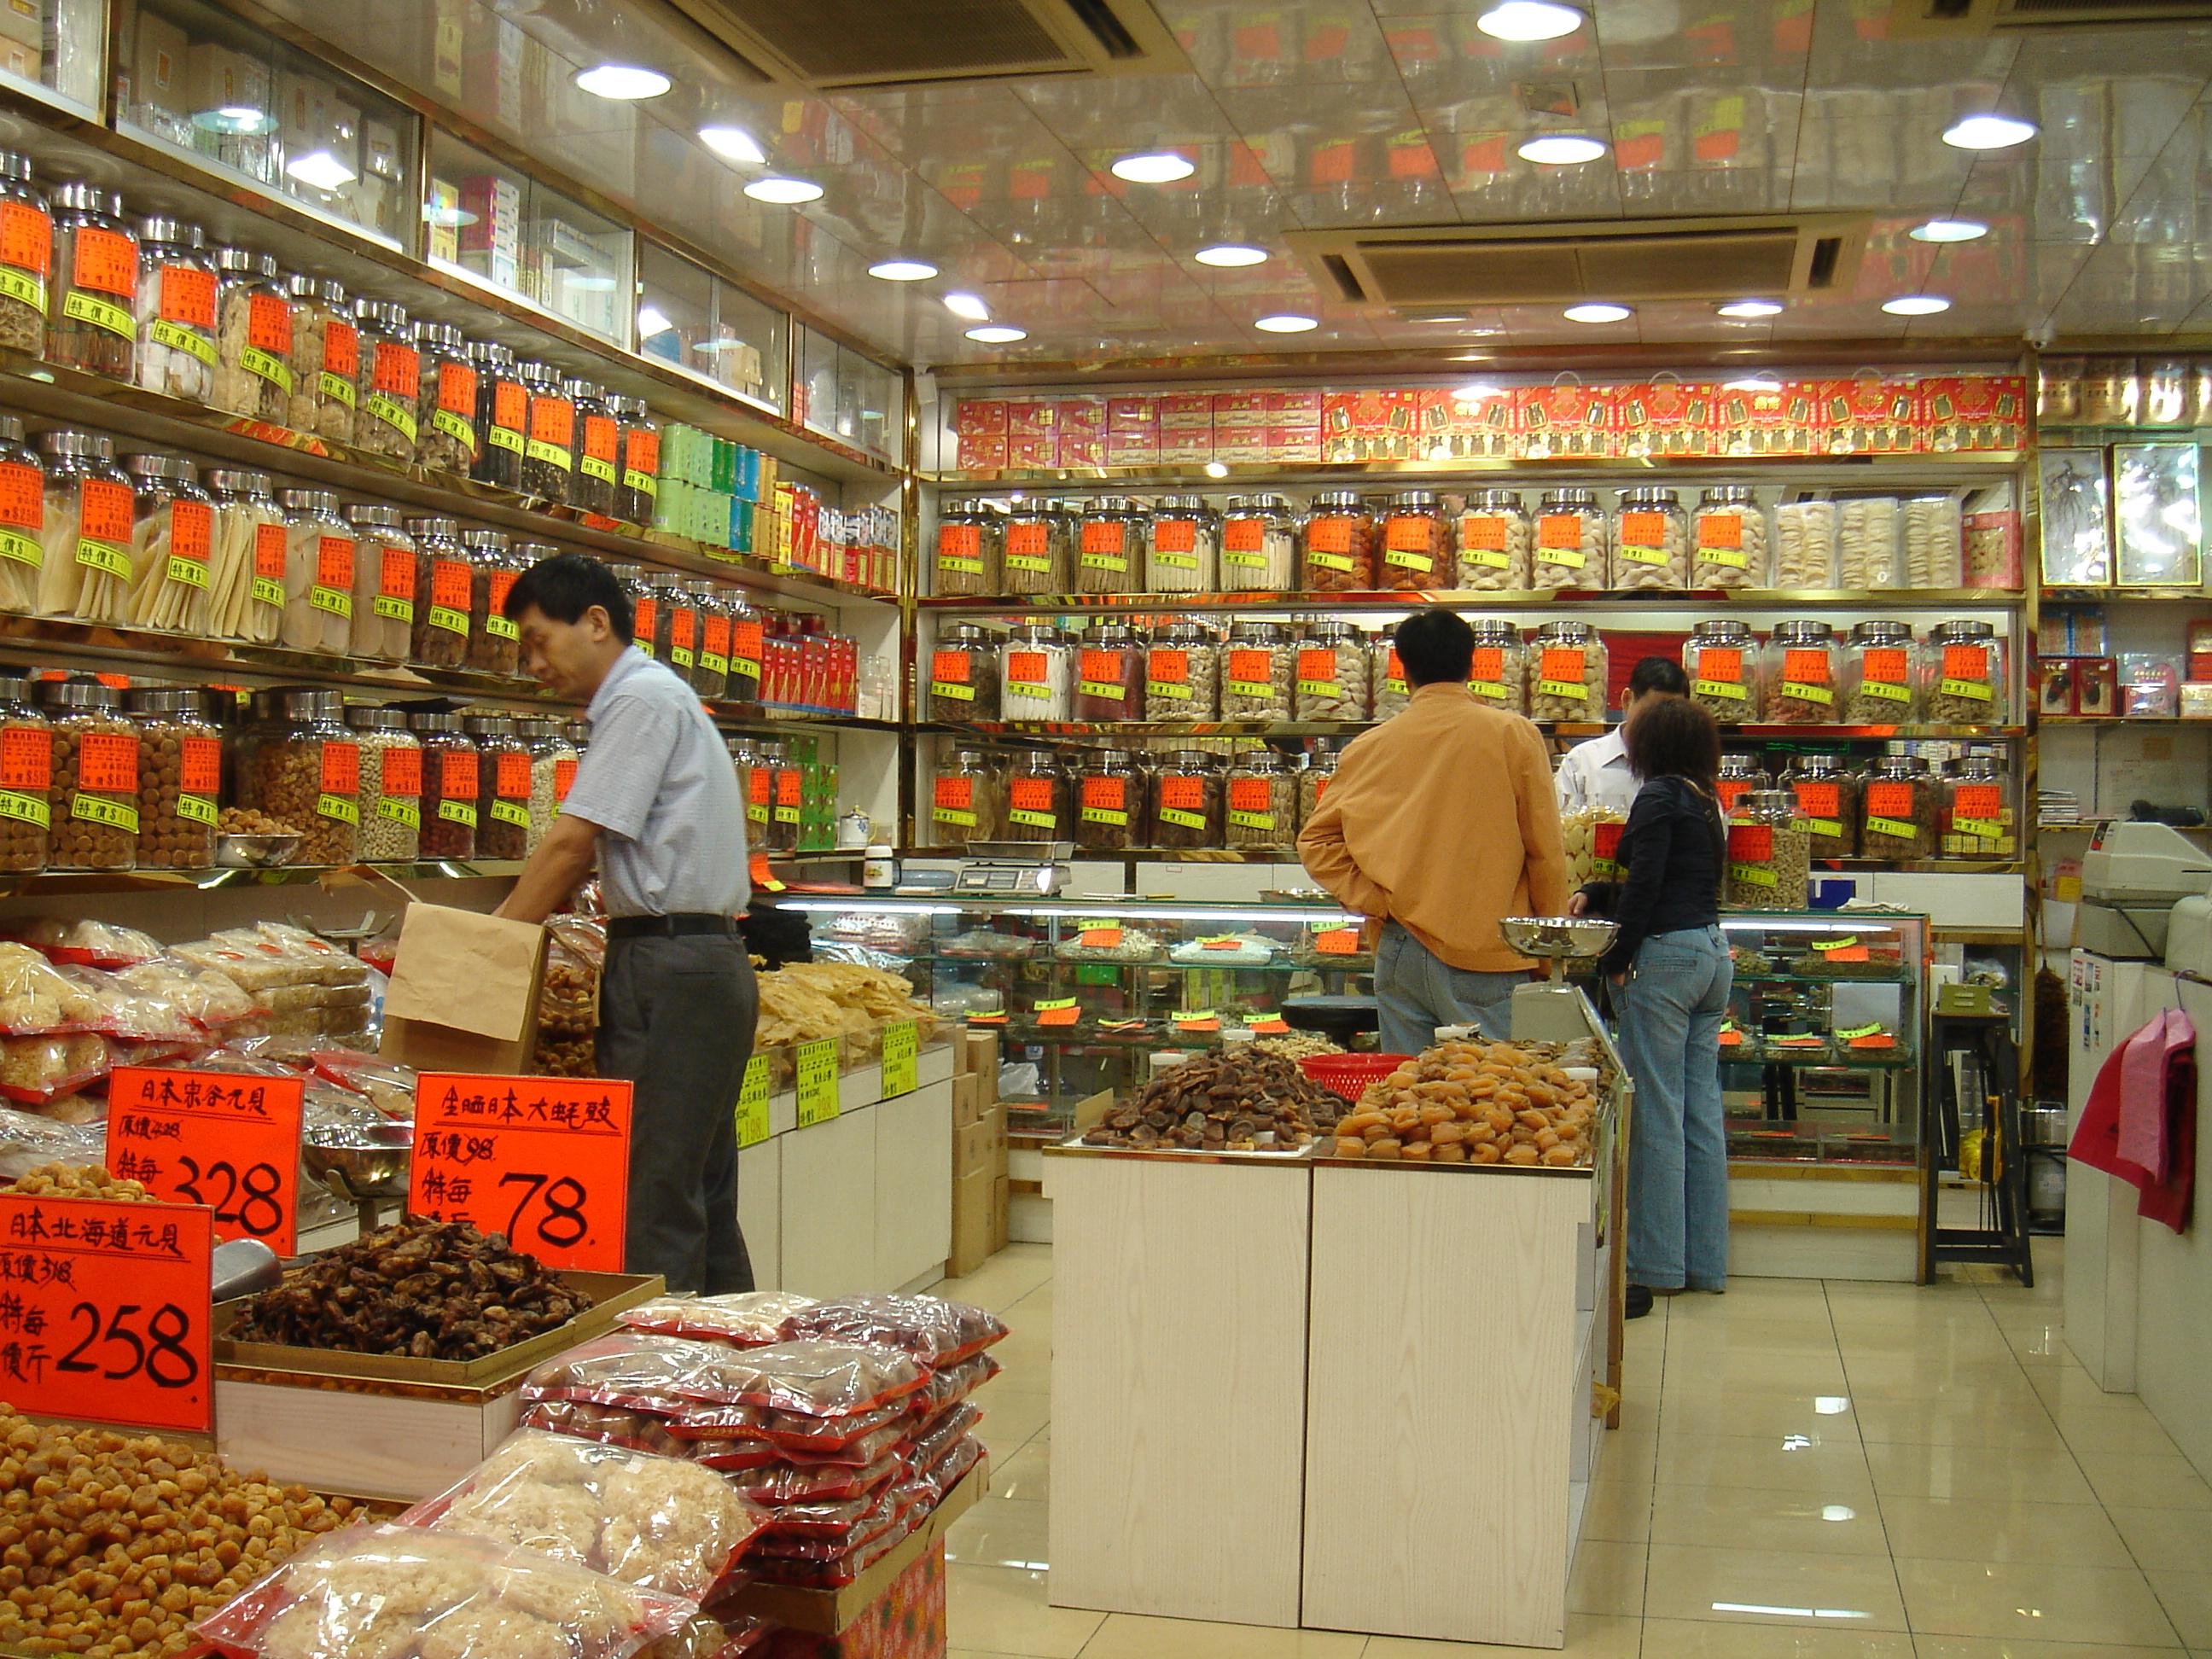 Traditionelle Arzneimittelhandlung in Hongkong Foto: Mailer diablo / wikipedia